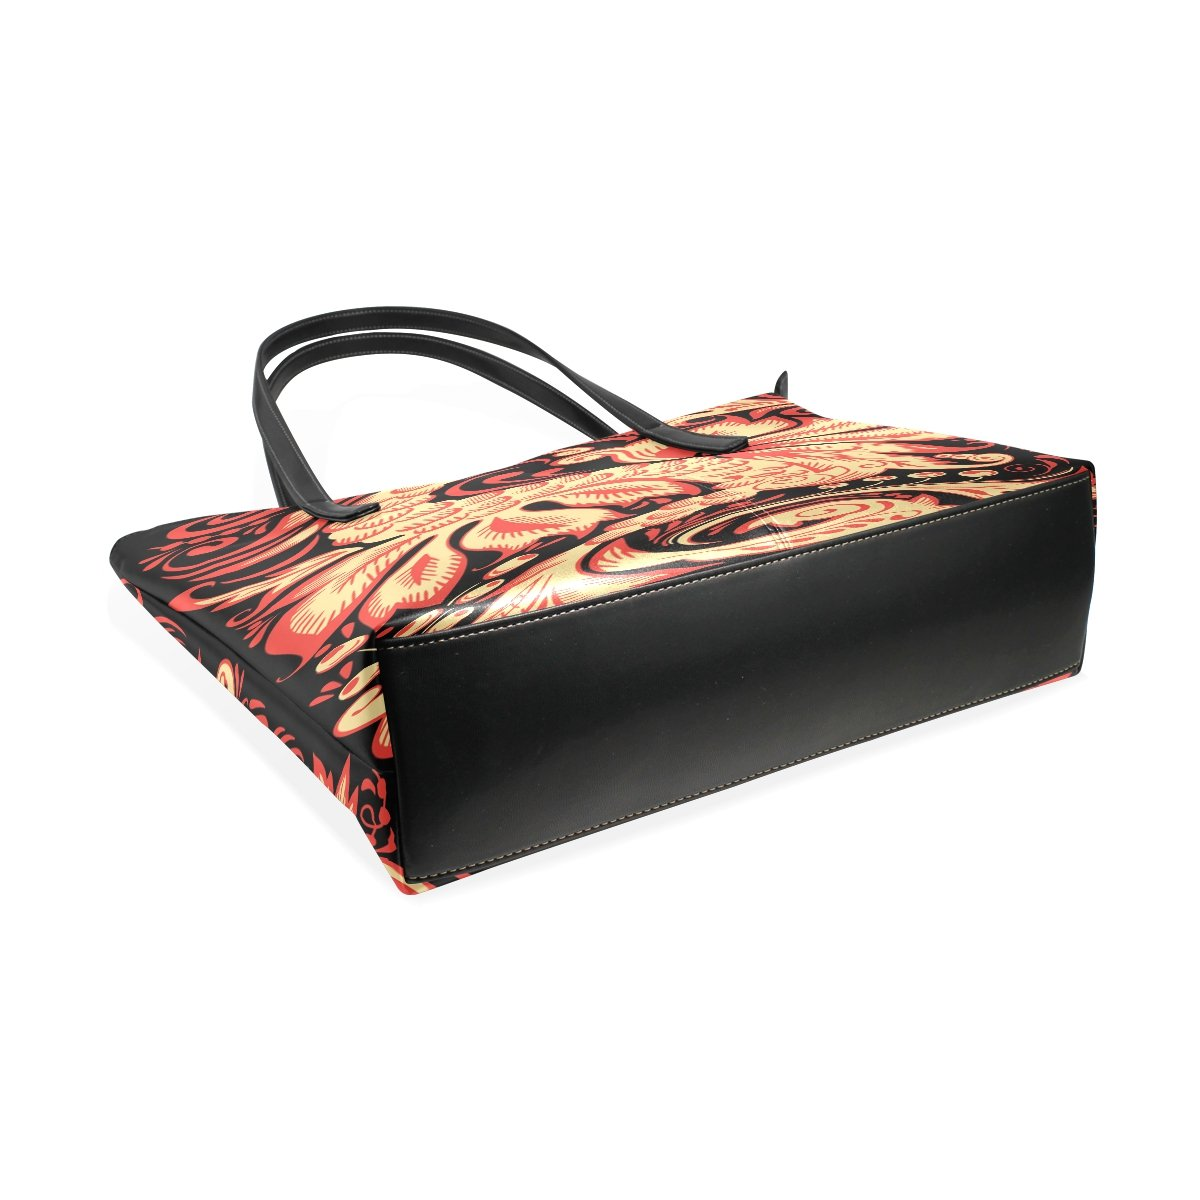 Women Leather Handbags Phenix Figure Top Handle Shoulder Bags